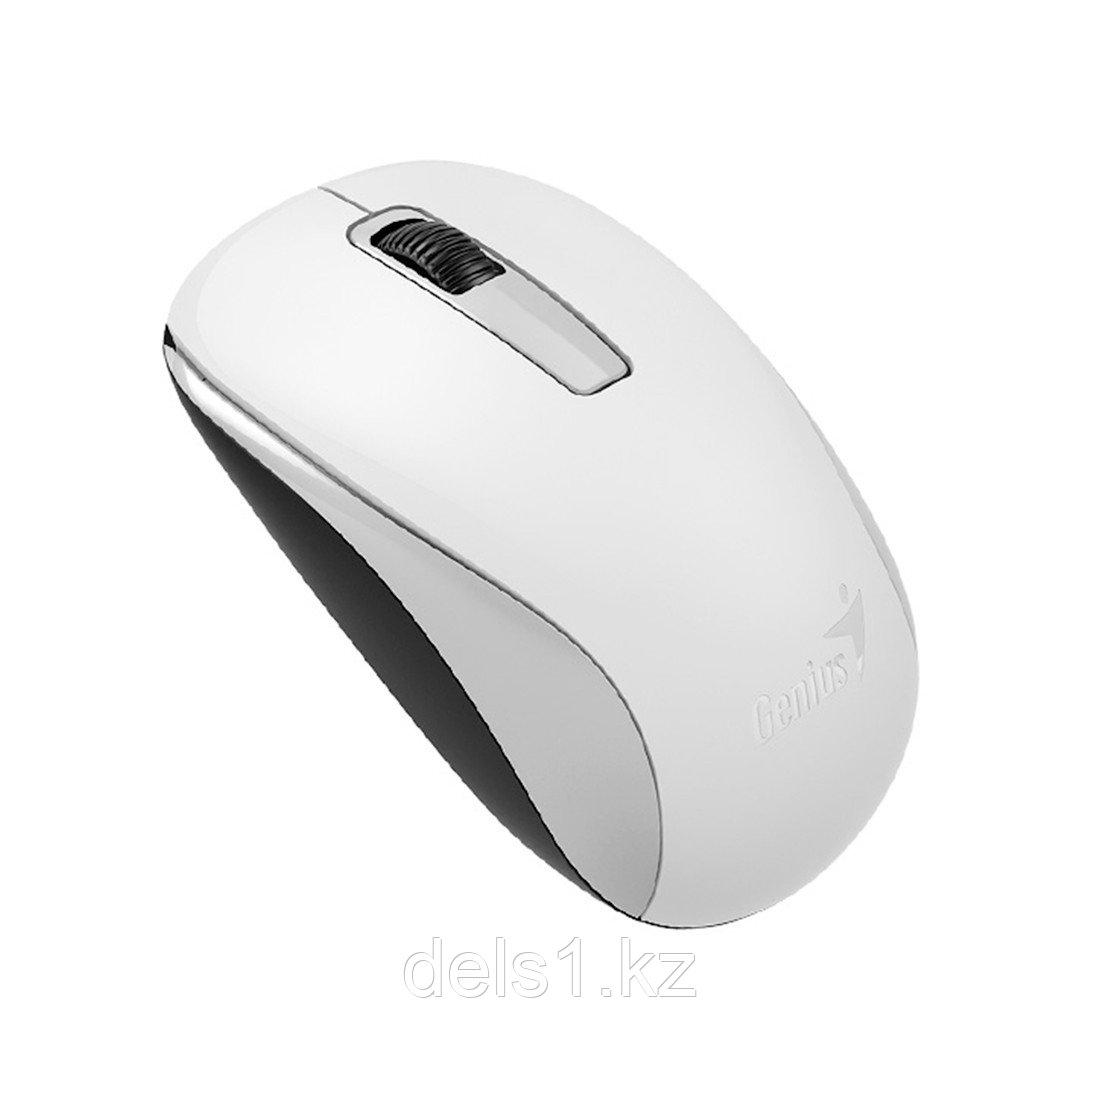 Компьютерная мышь Genius NX-7005 White